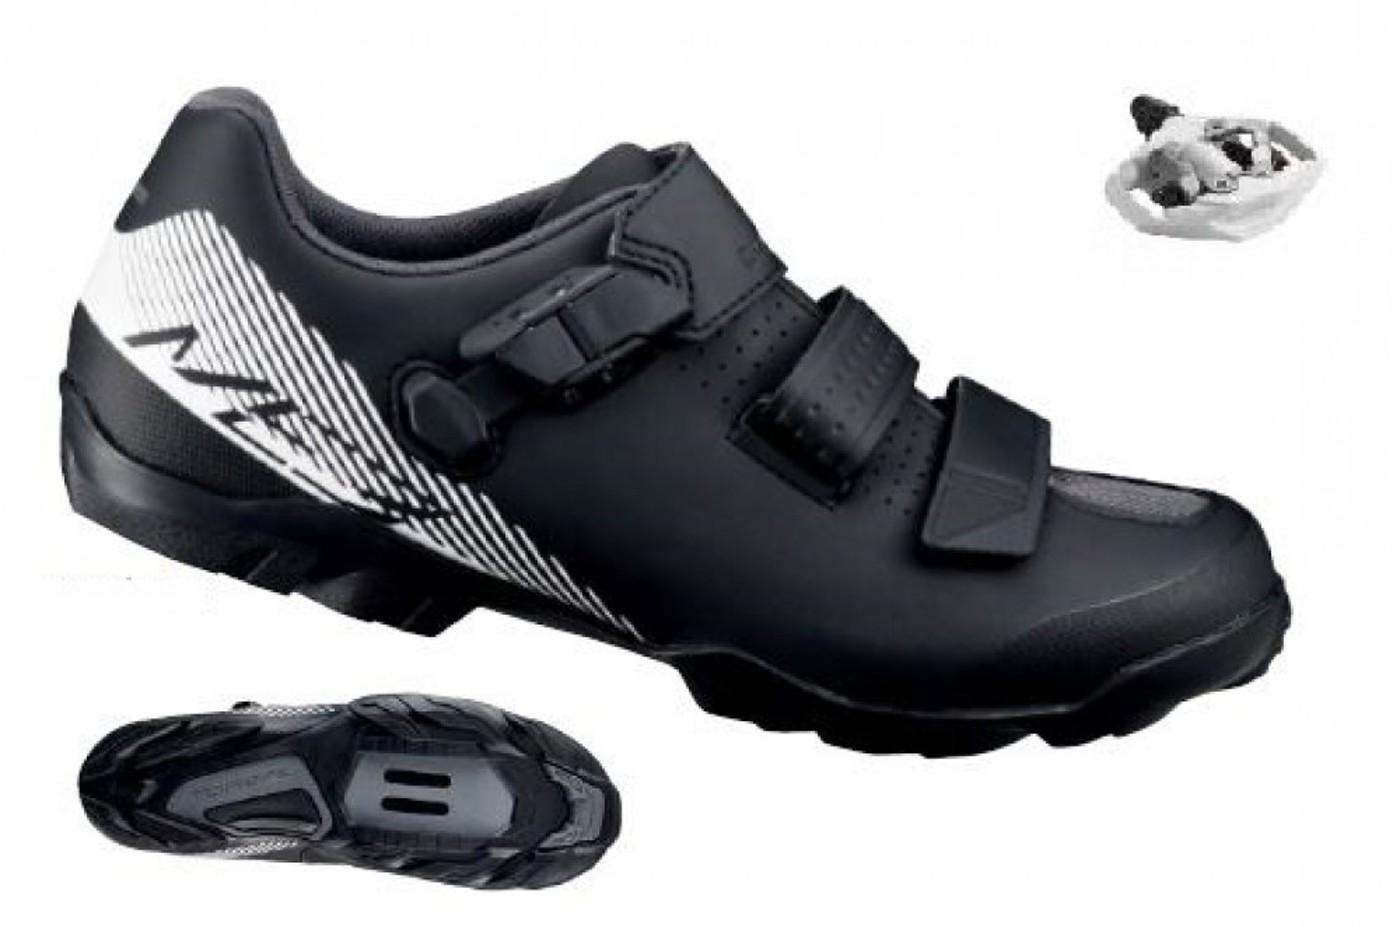 SHIMANO MTB-Schuh ME 300 L - Damen